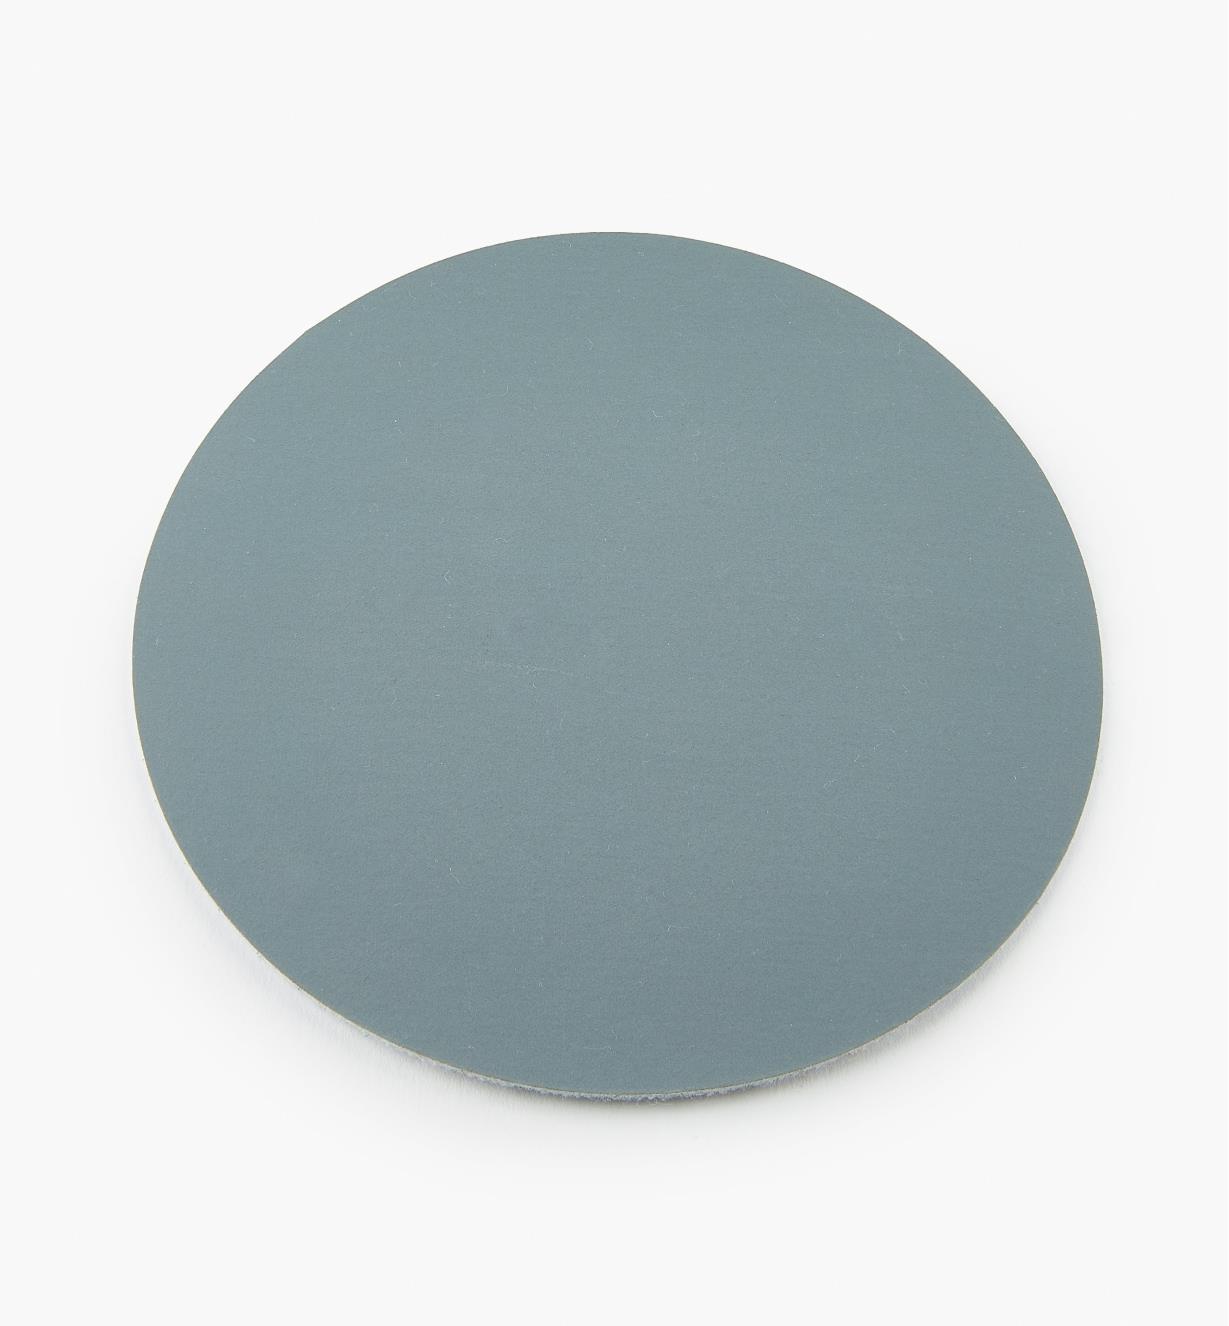 54K9035 - 6000x Micro-Mesh Disc, ea.